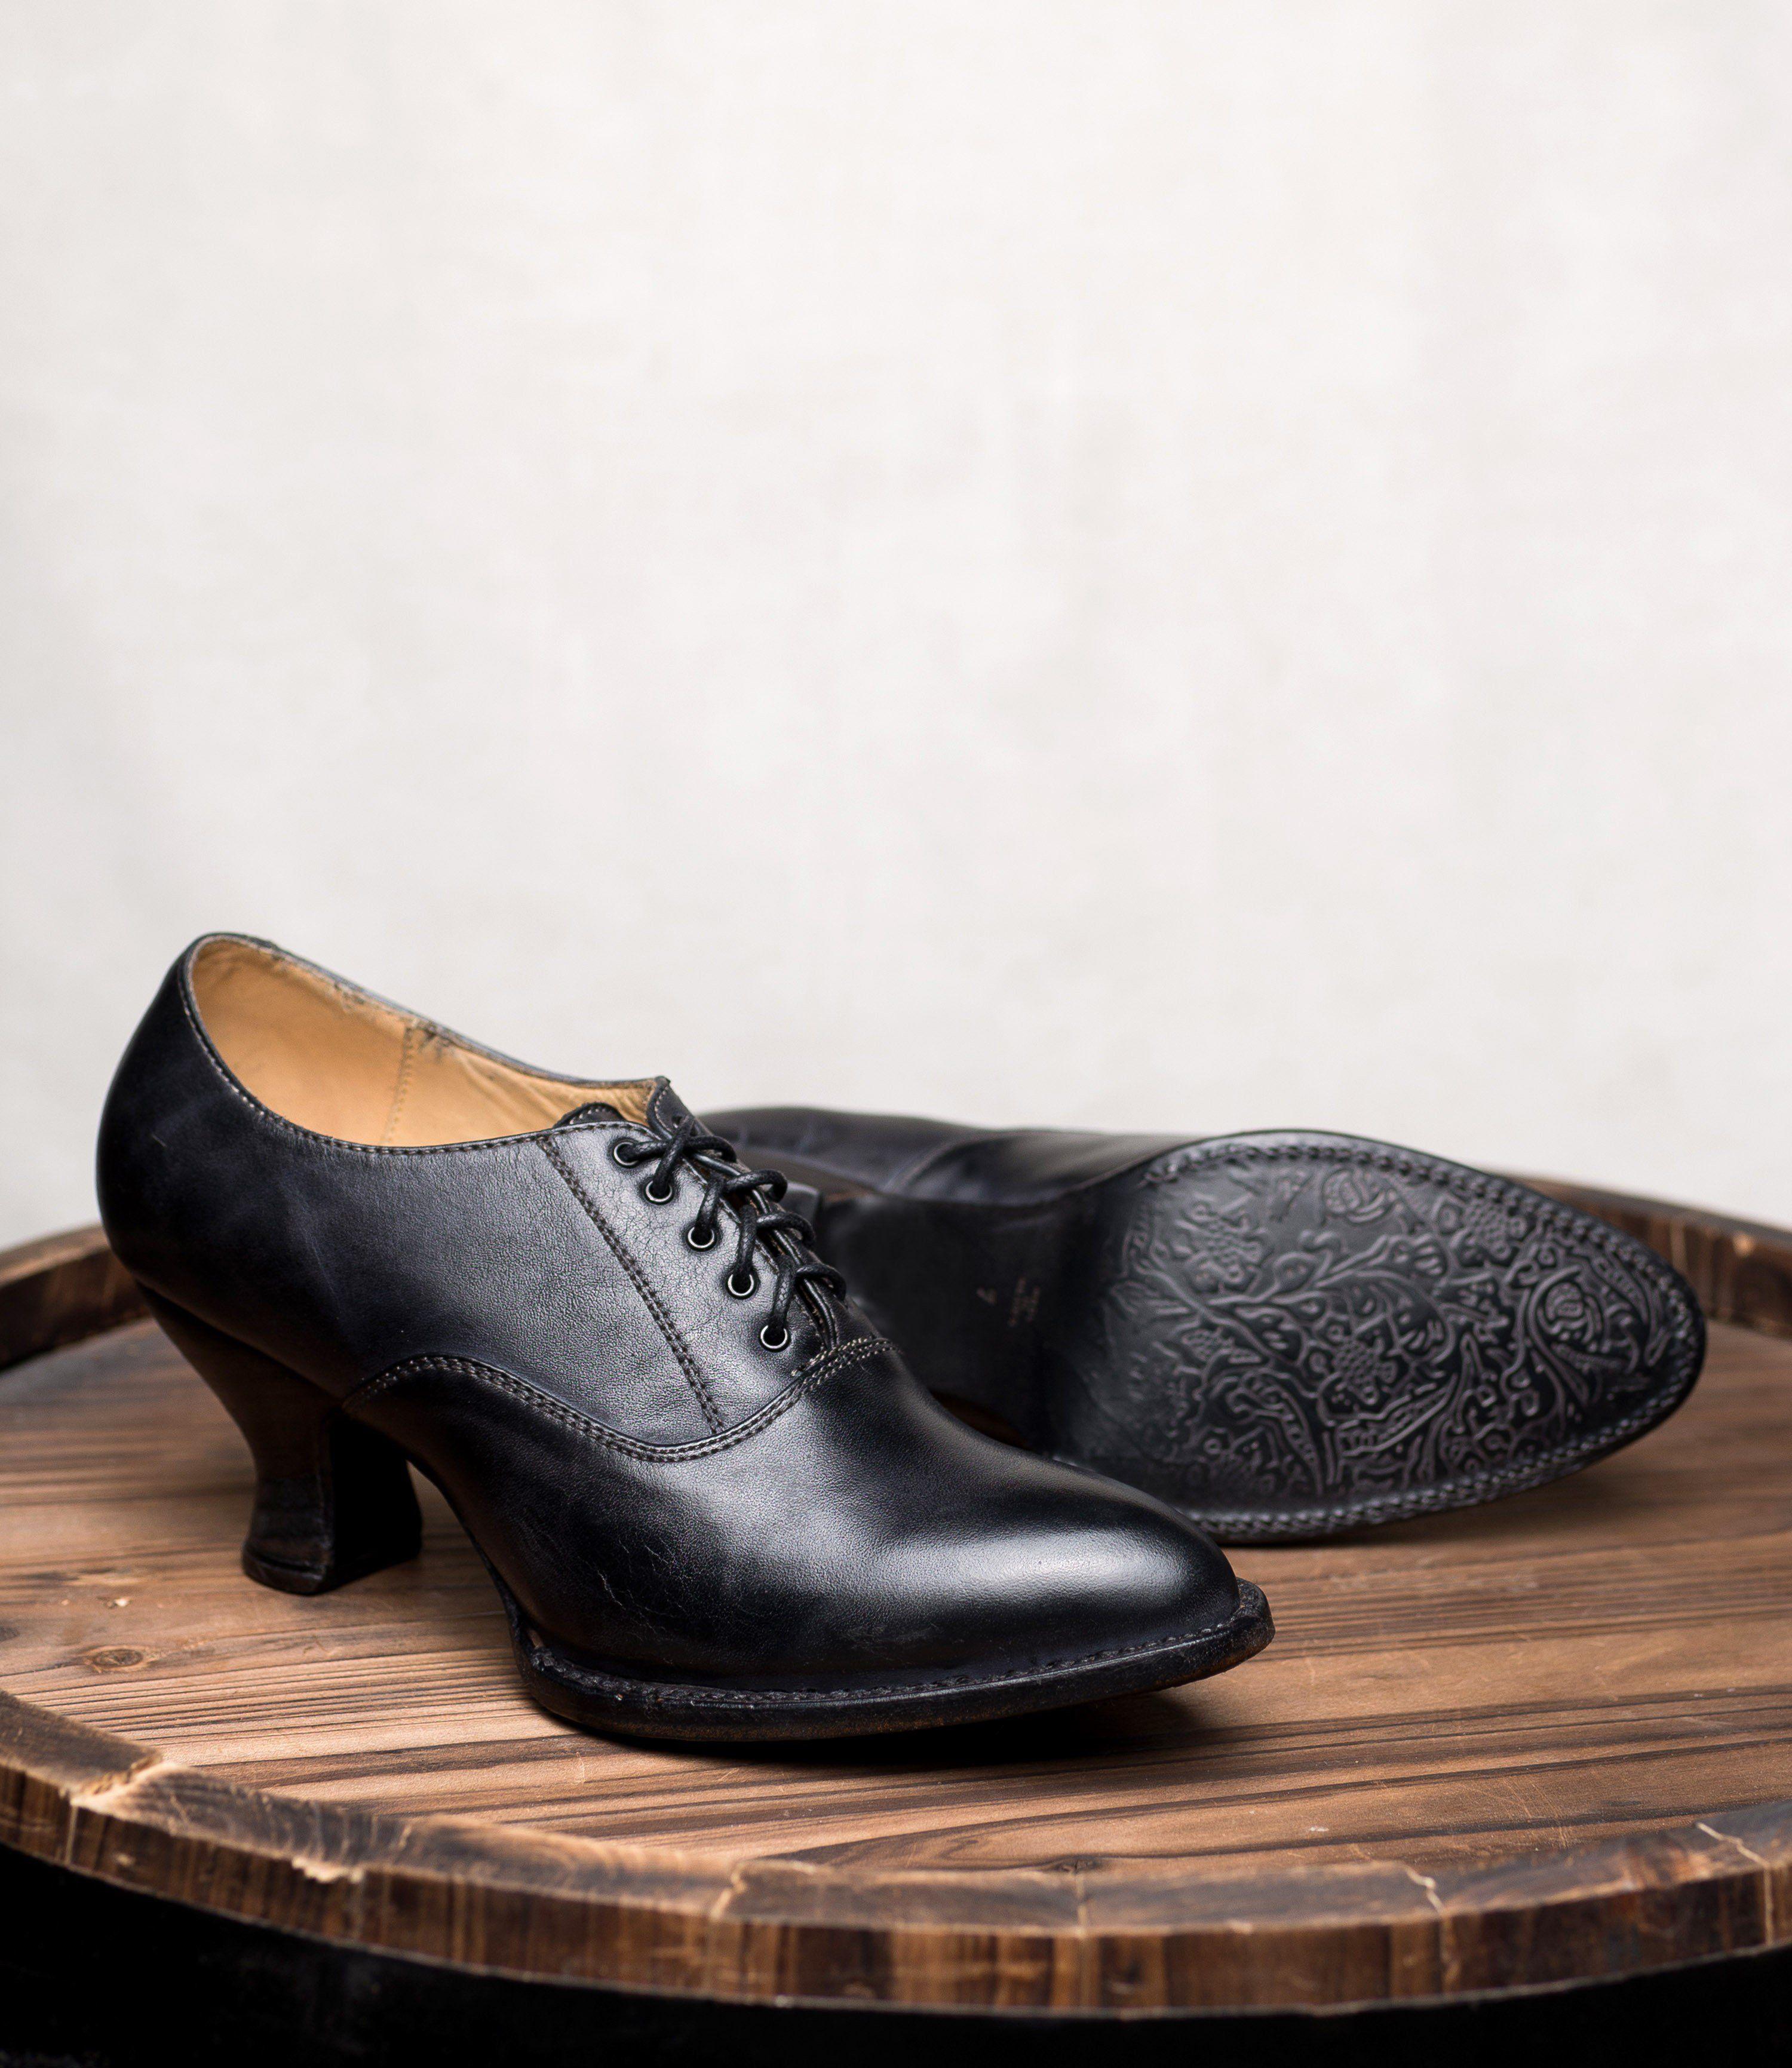 87c9a3678e95 Victorian Shoes Victorian Style Leather Lace-Up Black Shoes  195.00 AT  vintagedancer.com